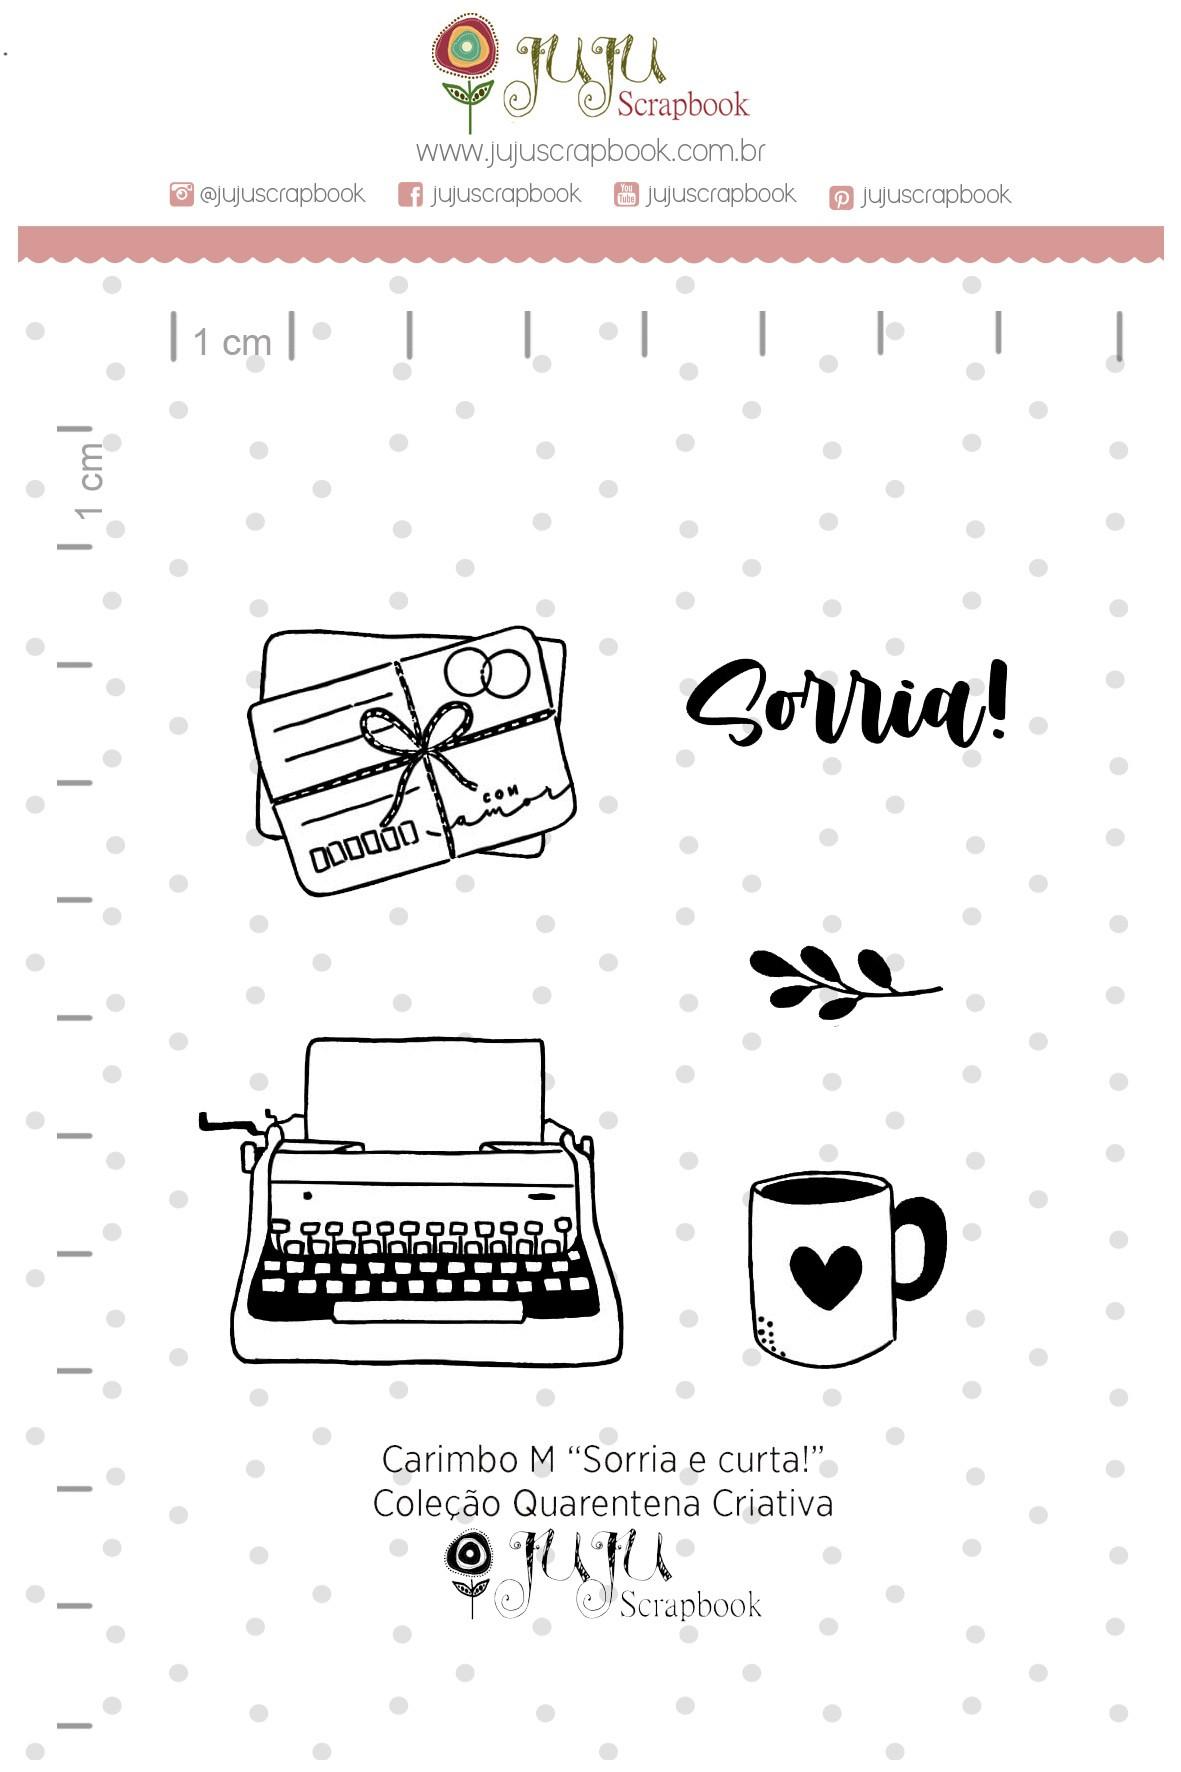 Kit de Carimbos  M - Sorria e Curta - Juju Scrapbook